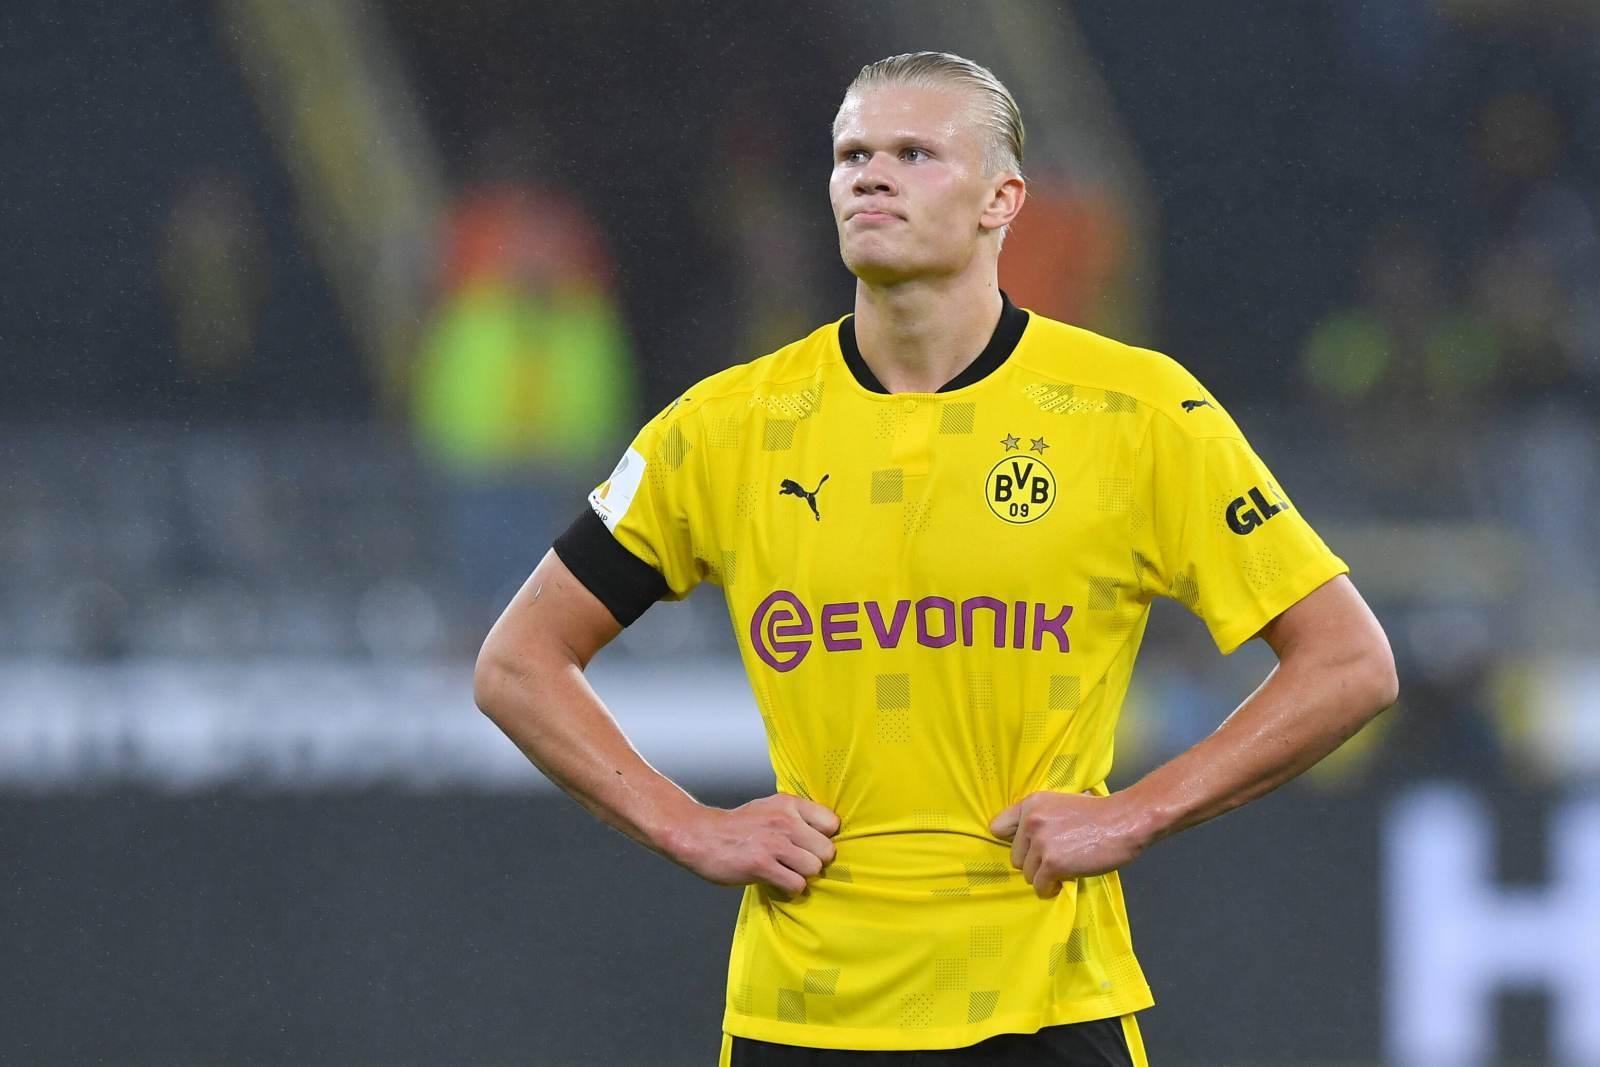 «Боруссия» Дортмунд на 90-й минуте едва не упустила победу, но выручил Холанн